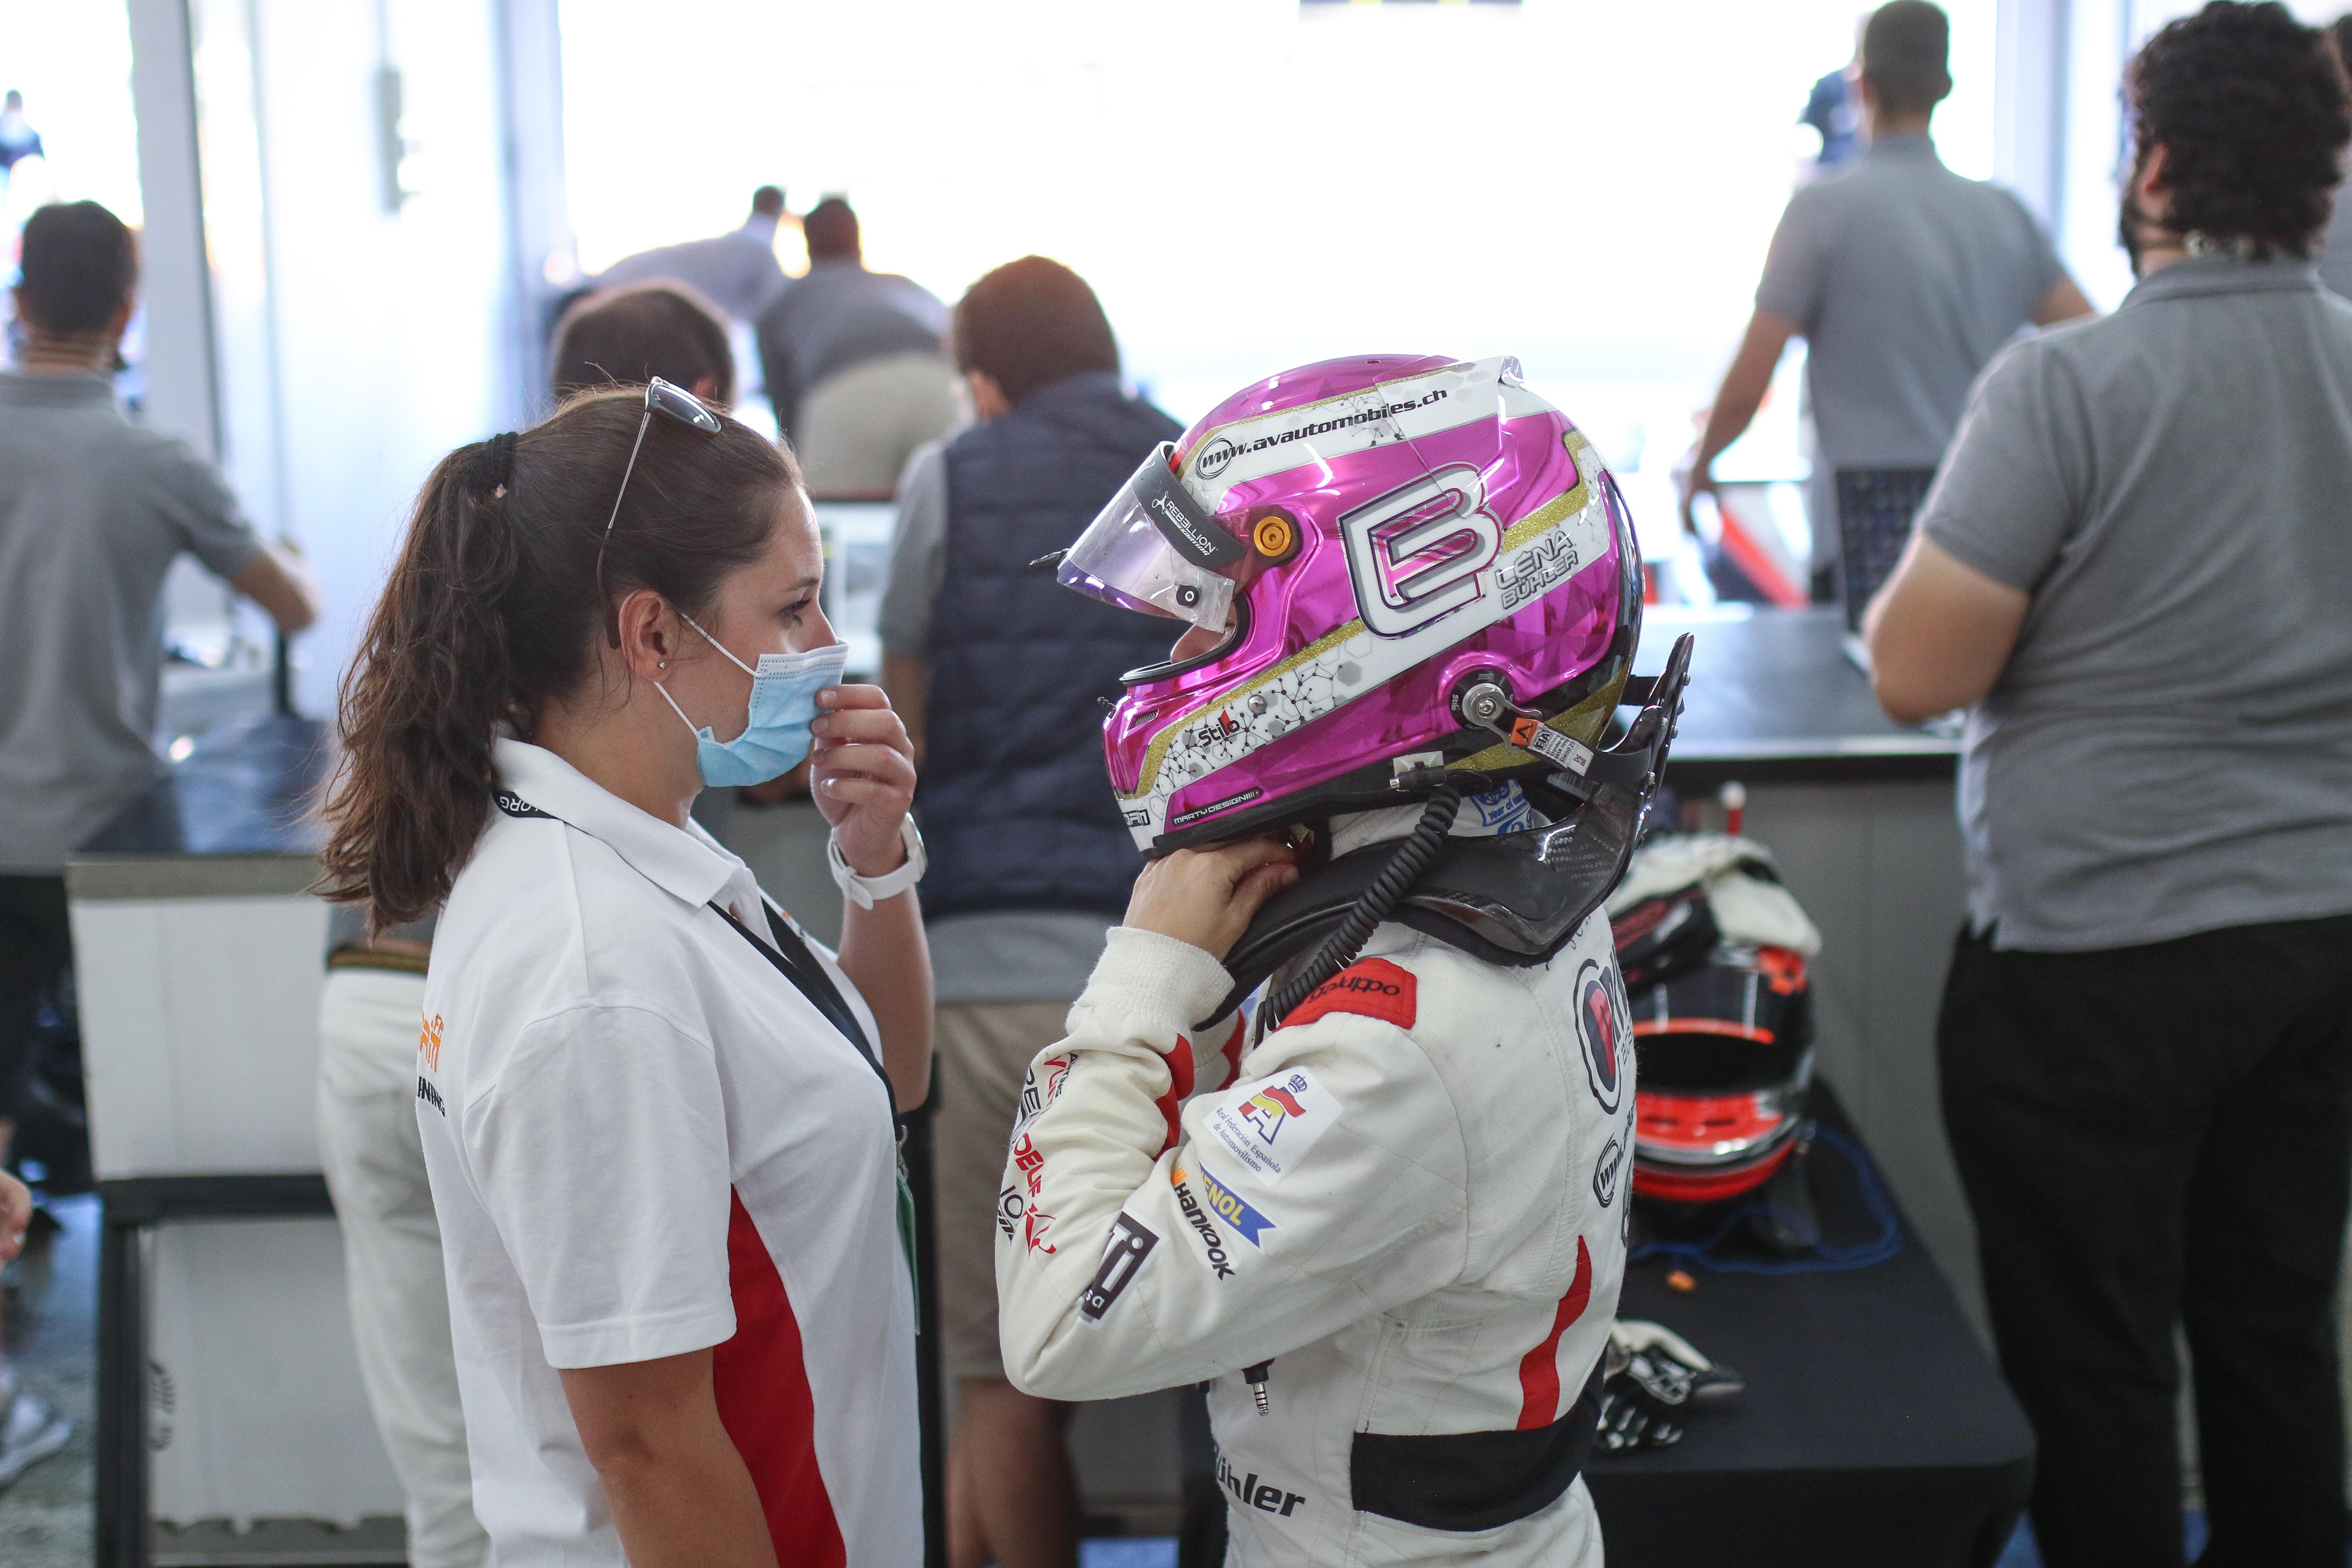 Léna Bühler on track in Aragón for the Spanish F4 Championship